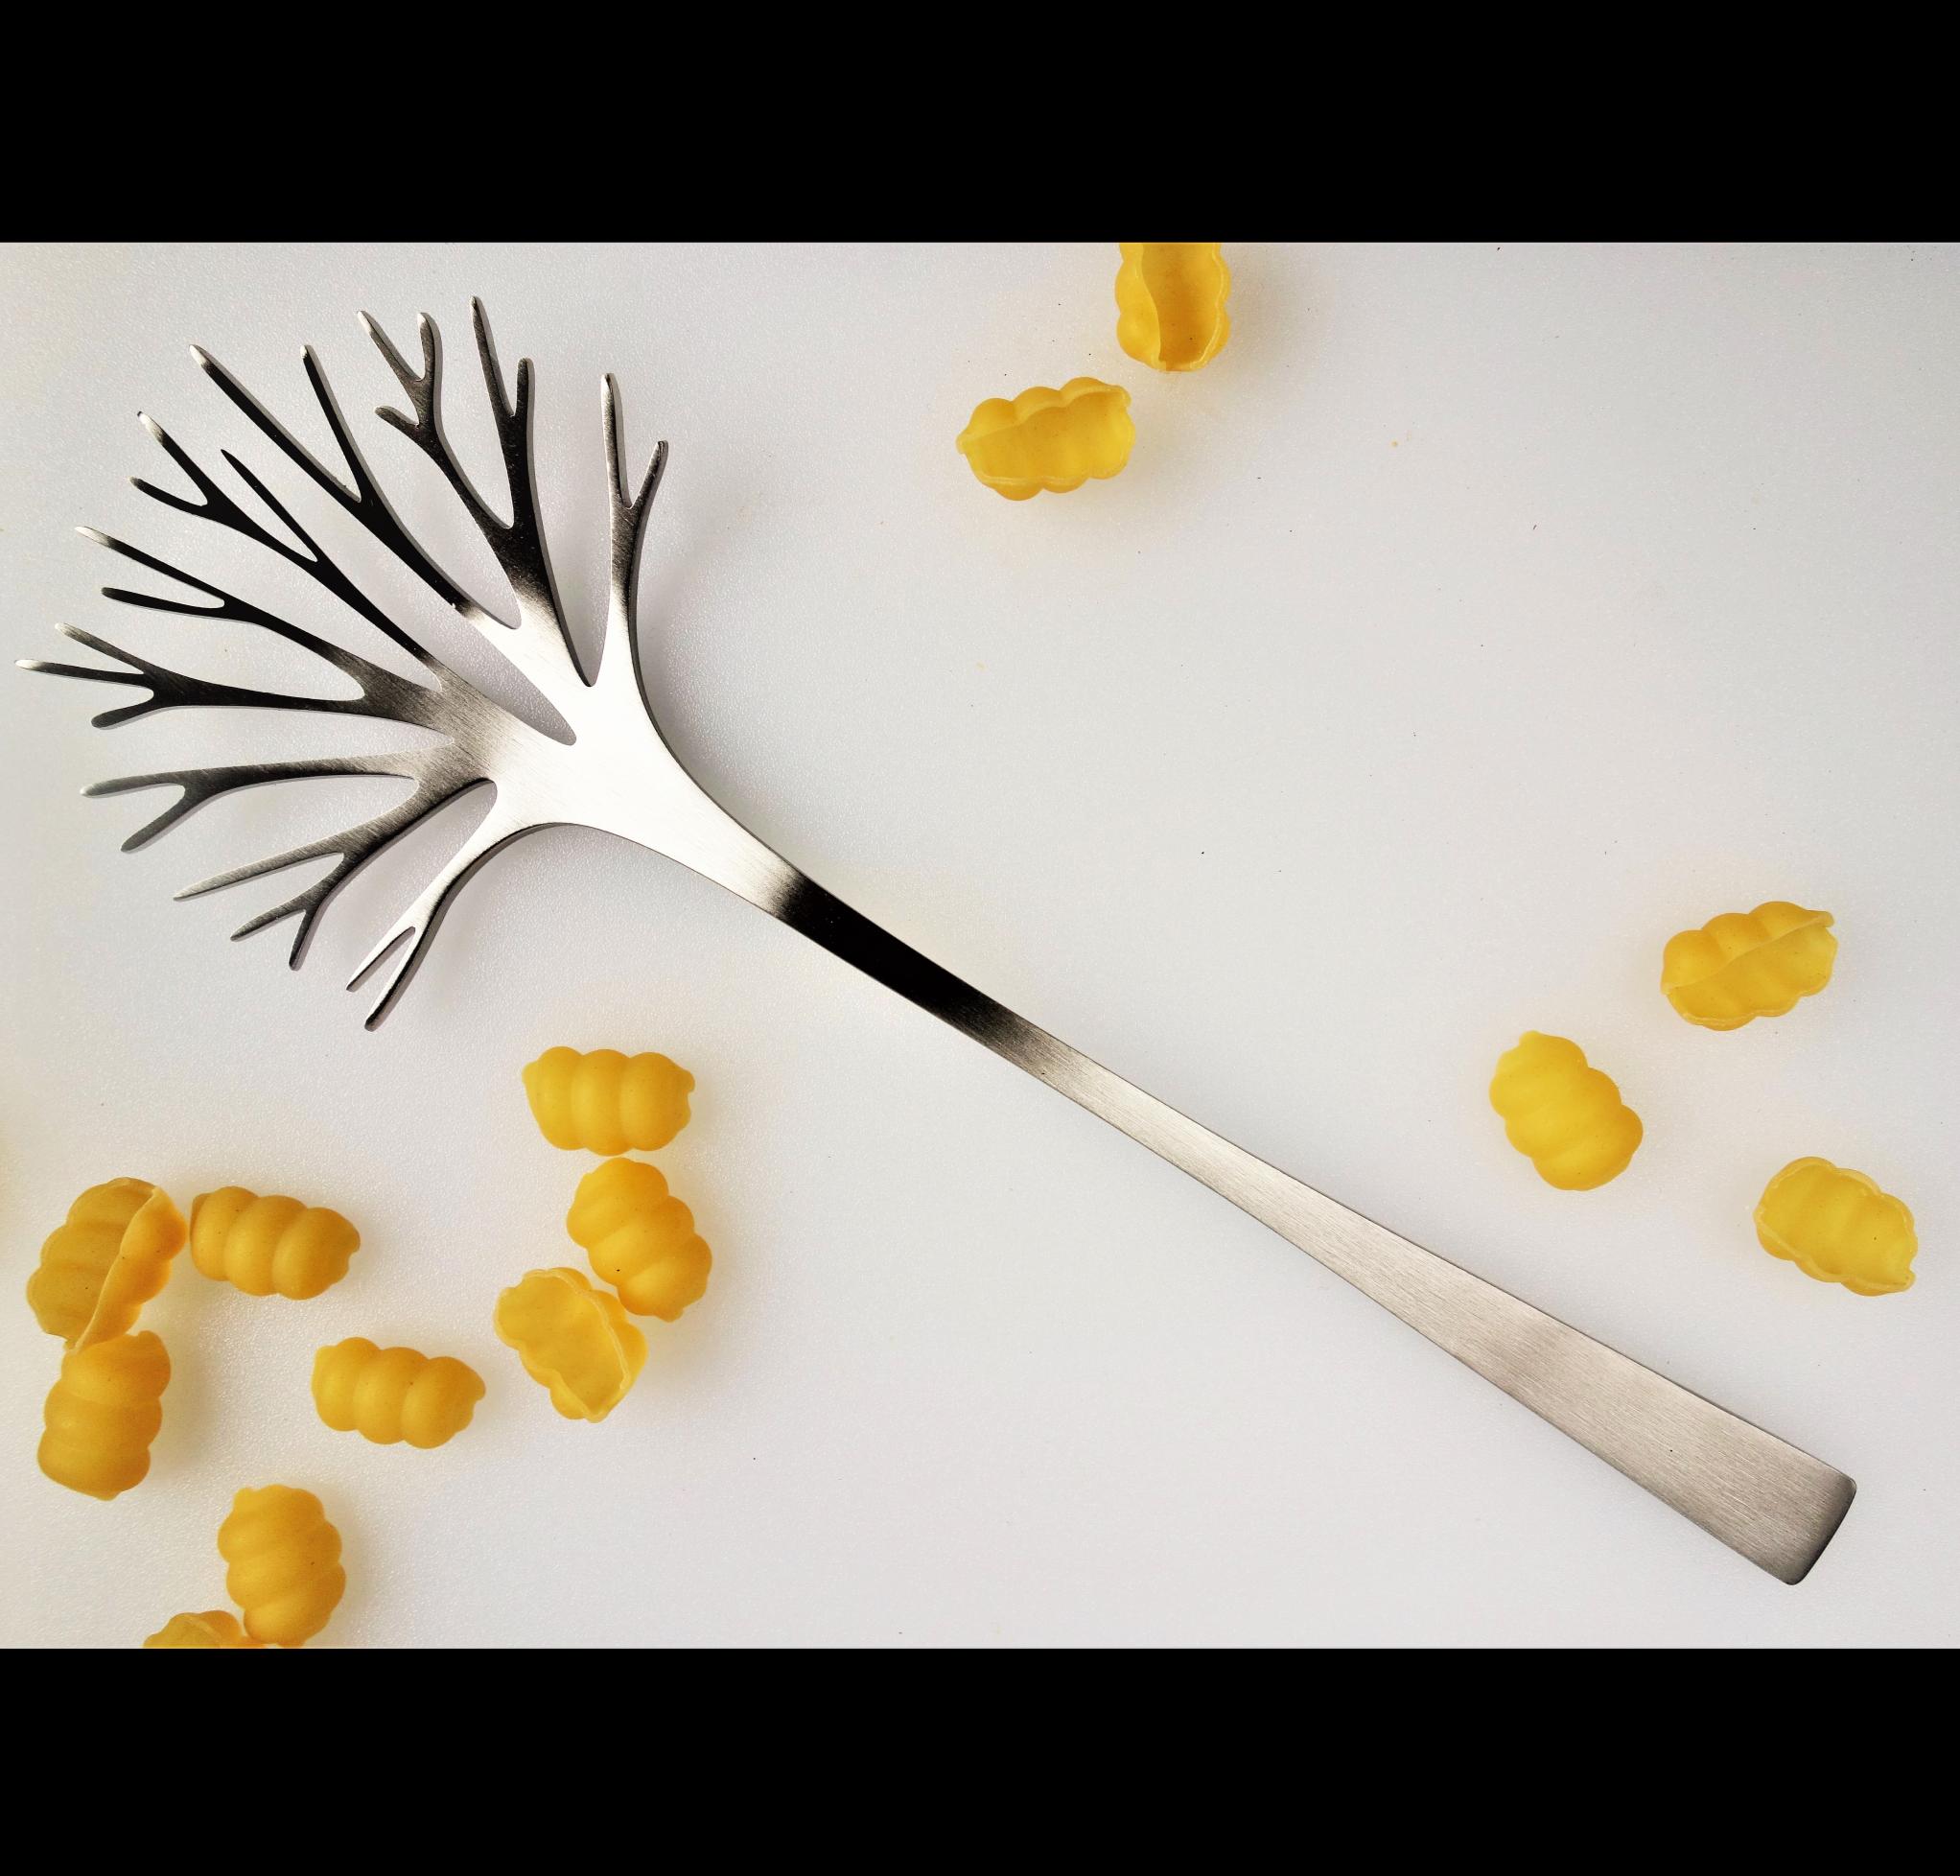 Pasta server - Brushed